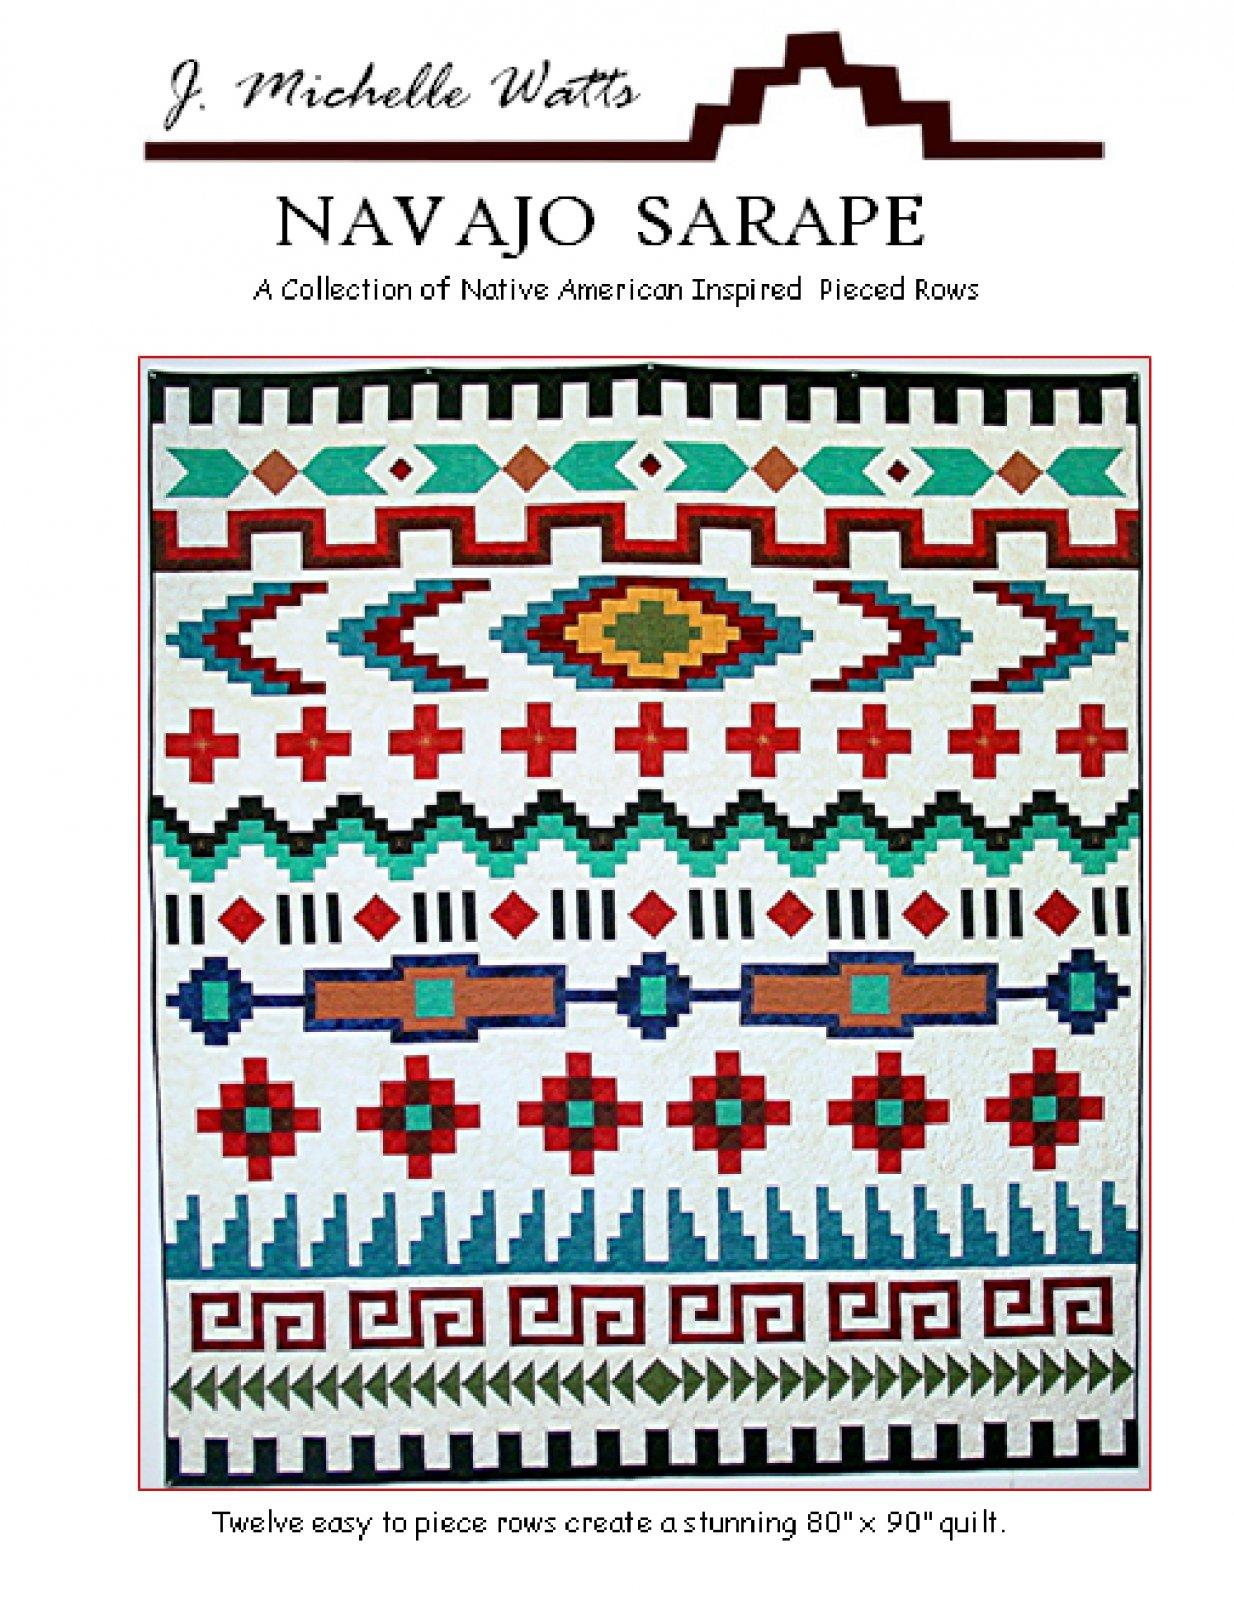 Navajo Sarape Quilt Pattern (J. Michelle Watts)